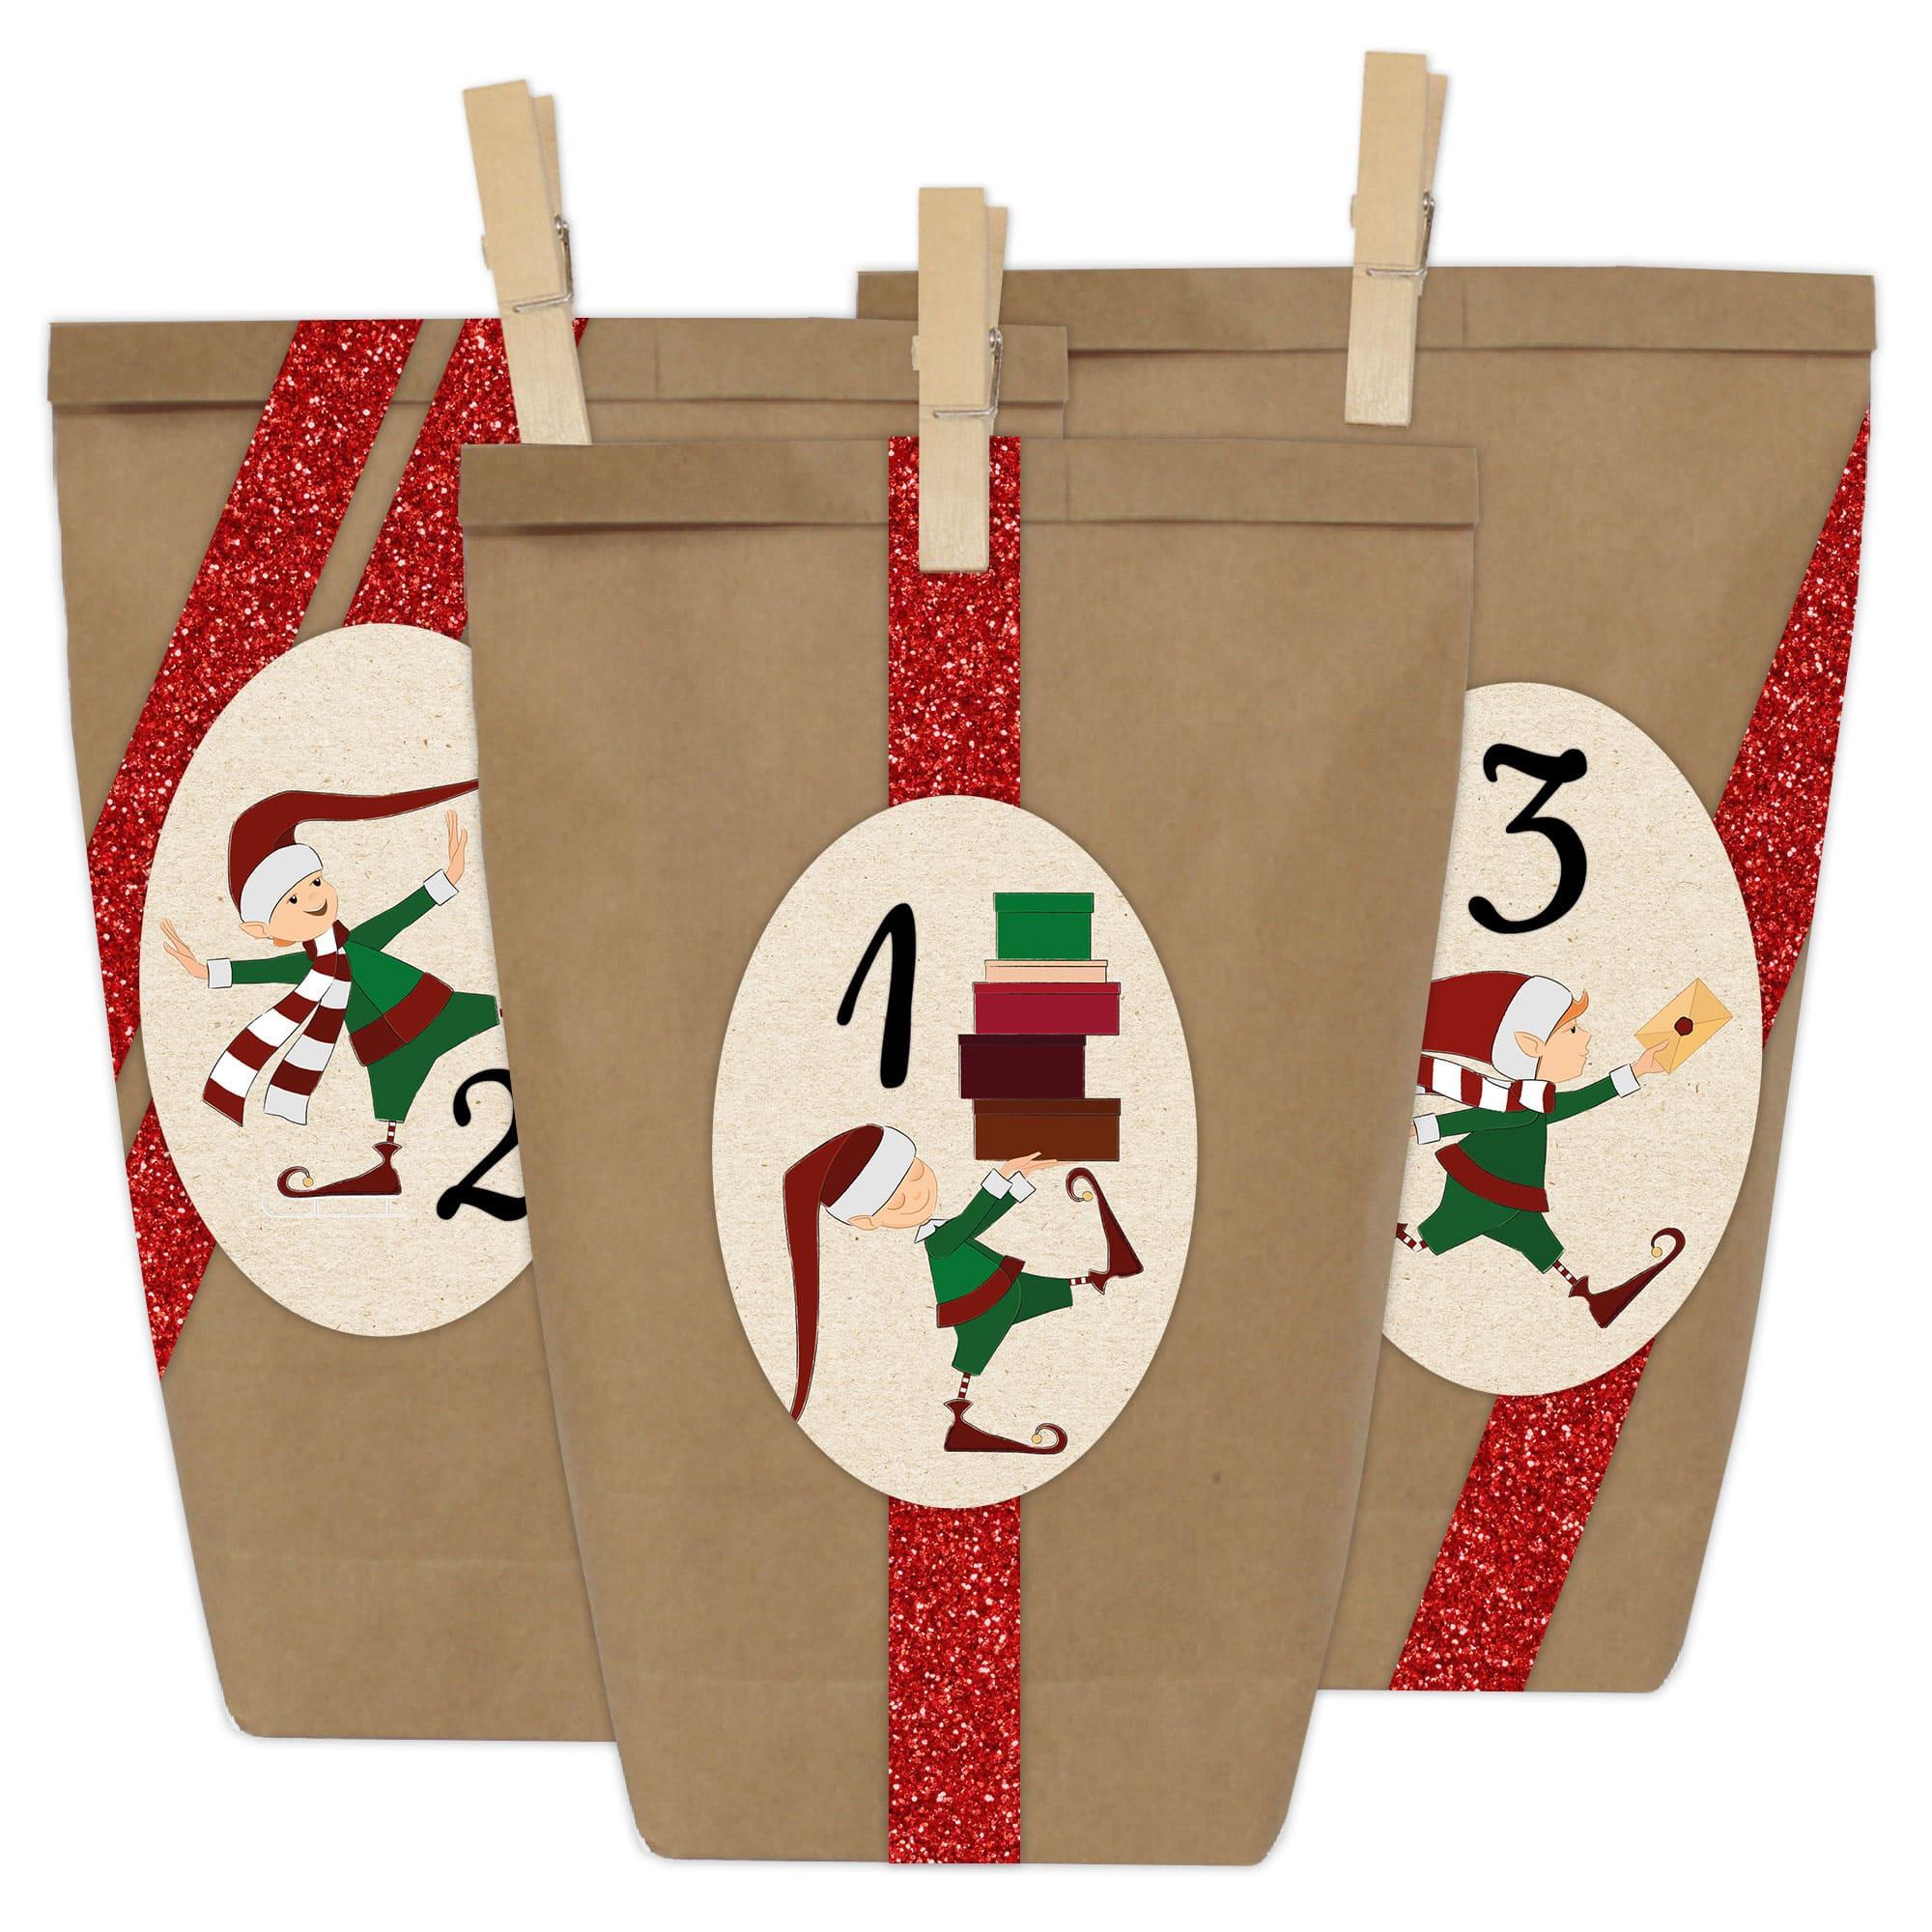 Diy Adventskalender 24 Papiertüten Motiv Weihnachtselfe Oval